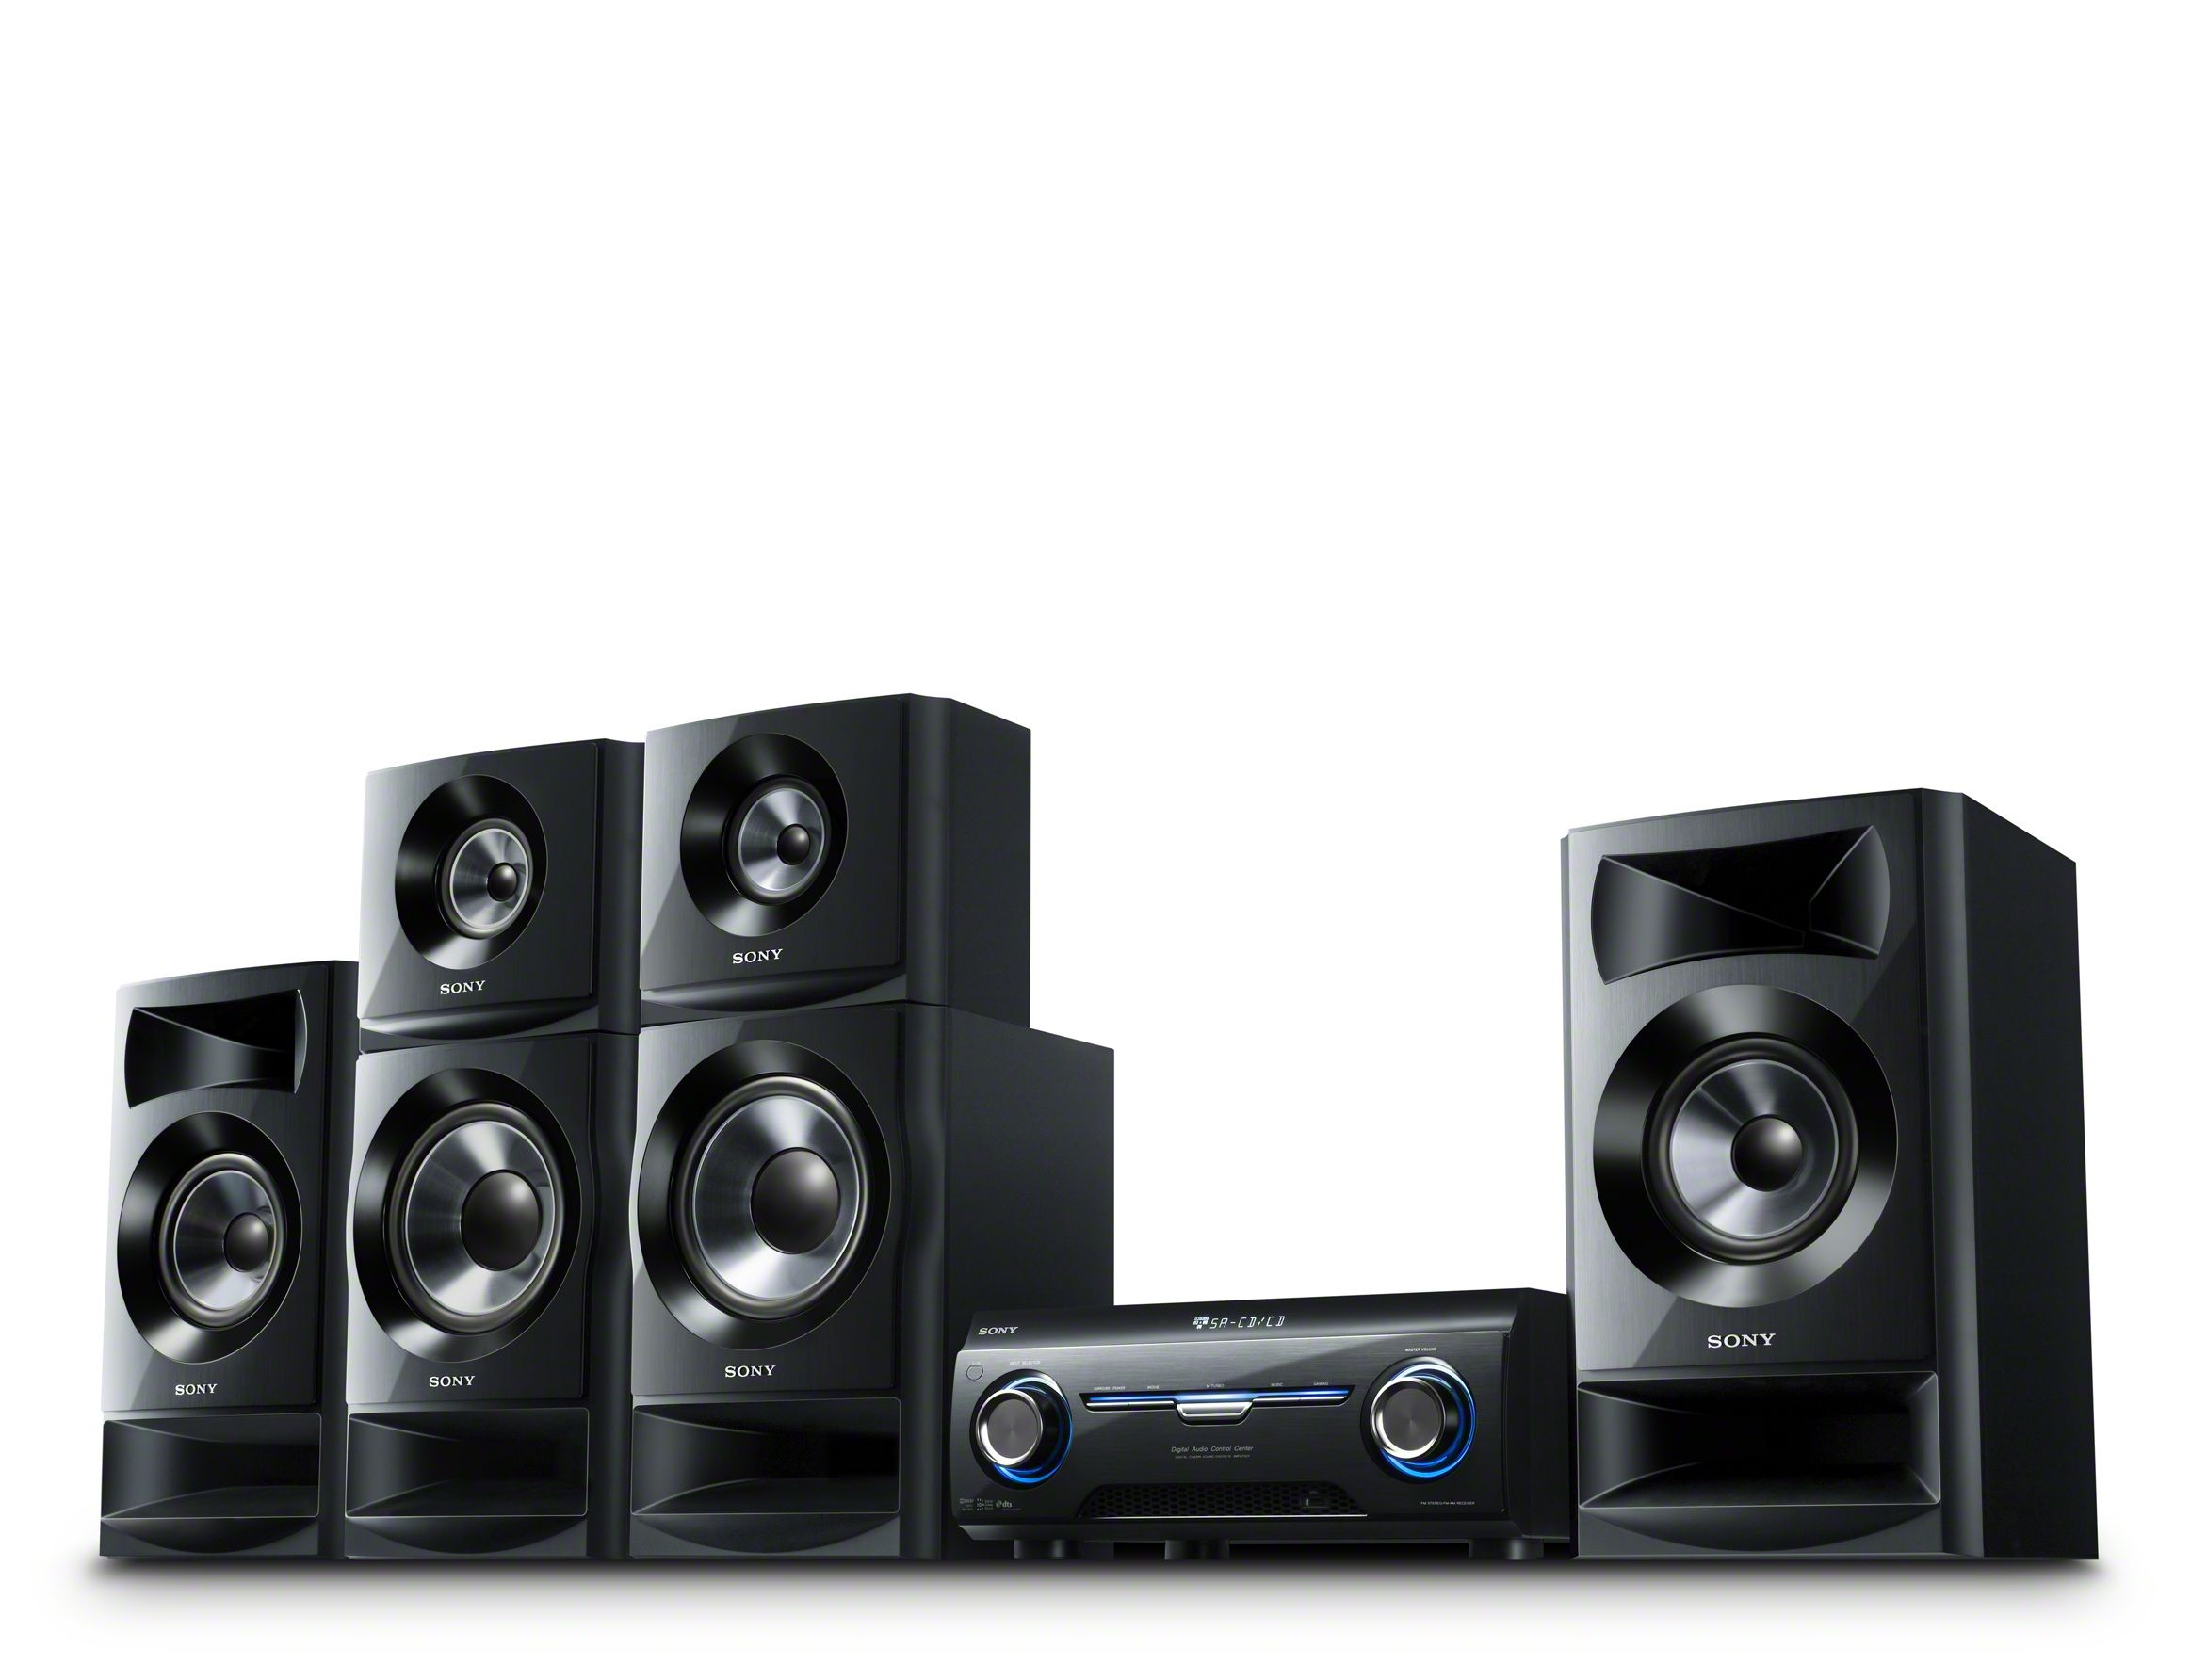 Shiny Sony Speakers Loudspeaker Design Systems Audio System Xplod Deck Wiring Diagram Sonys